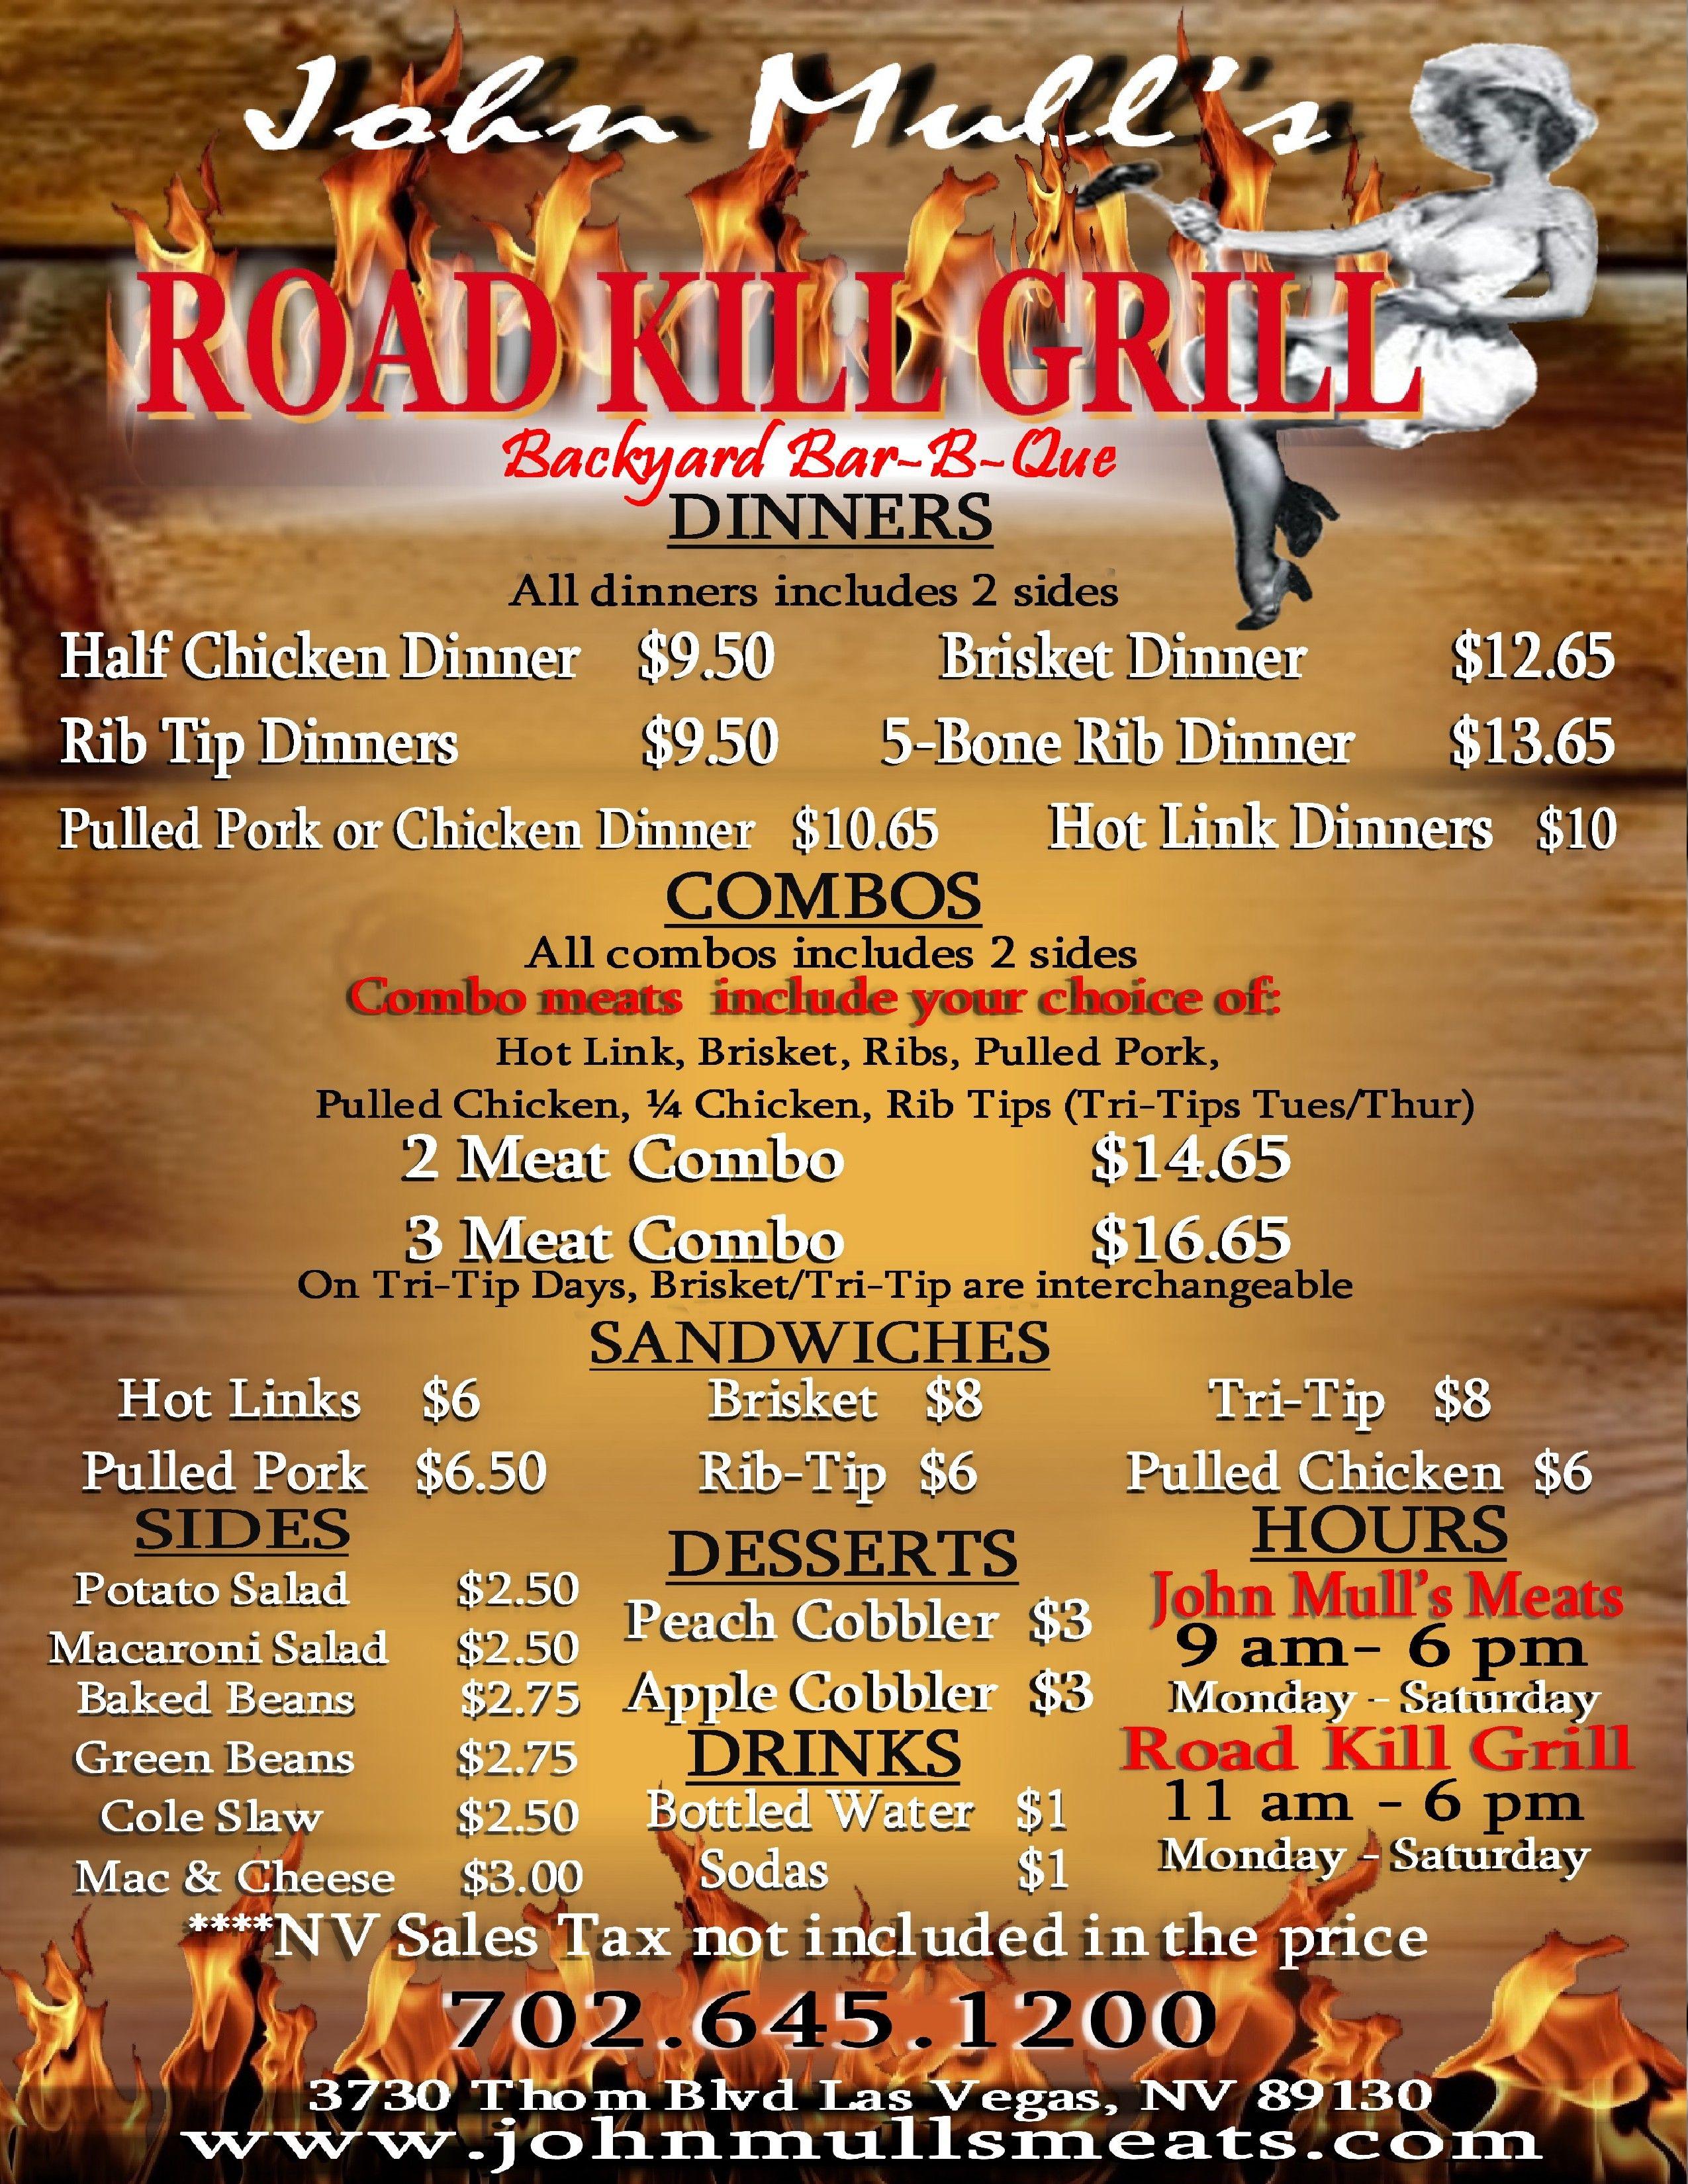 Roadkill Cafe Menu Las Vegas